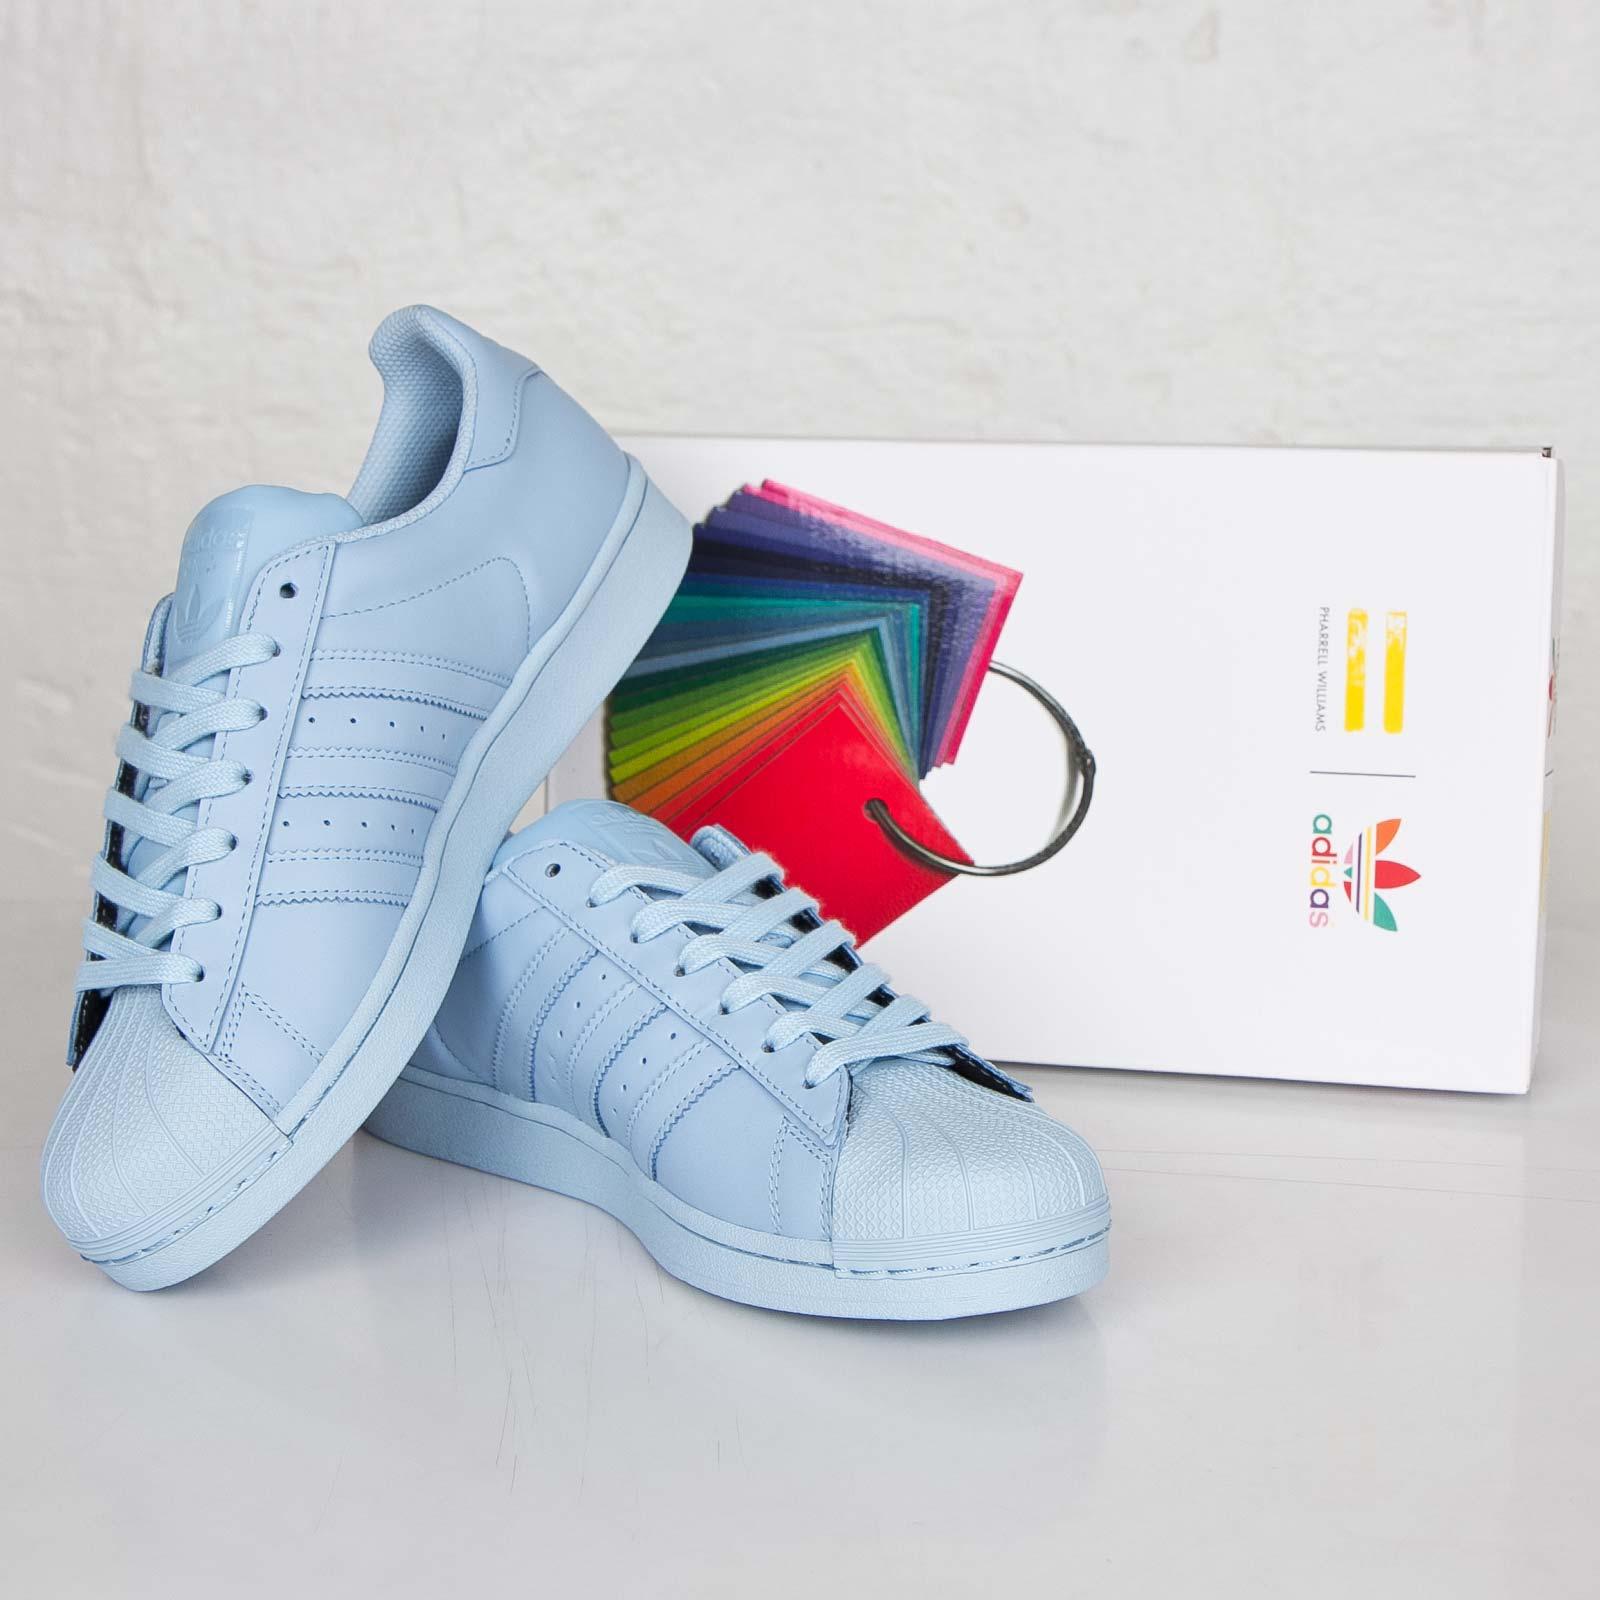 Adidas Originals X Pharrell Superstar Supercolor Clear Sky